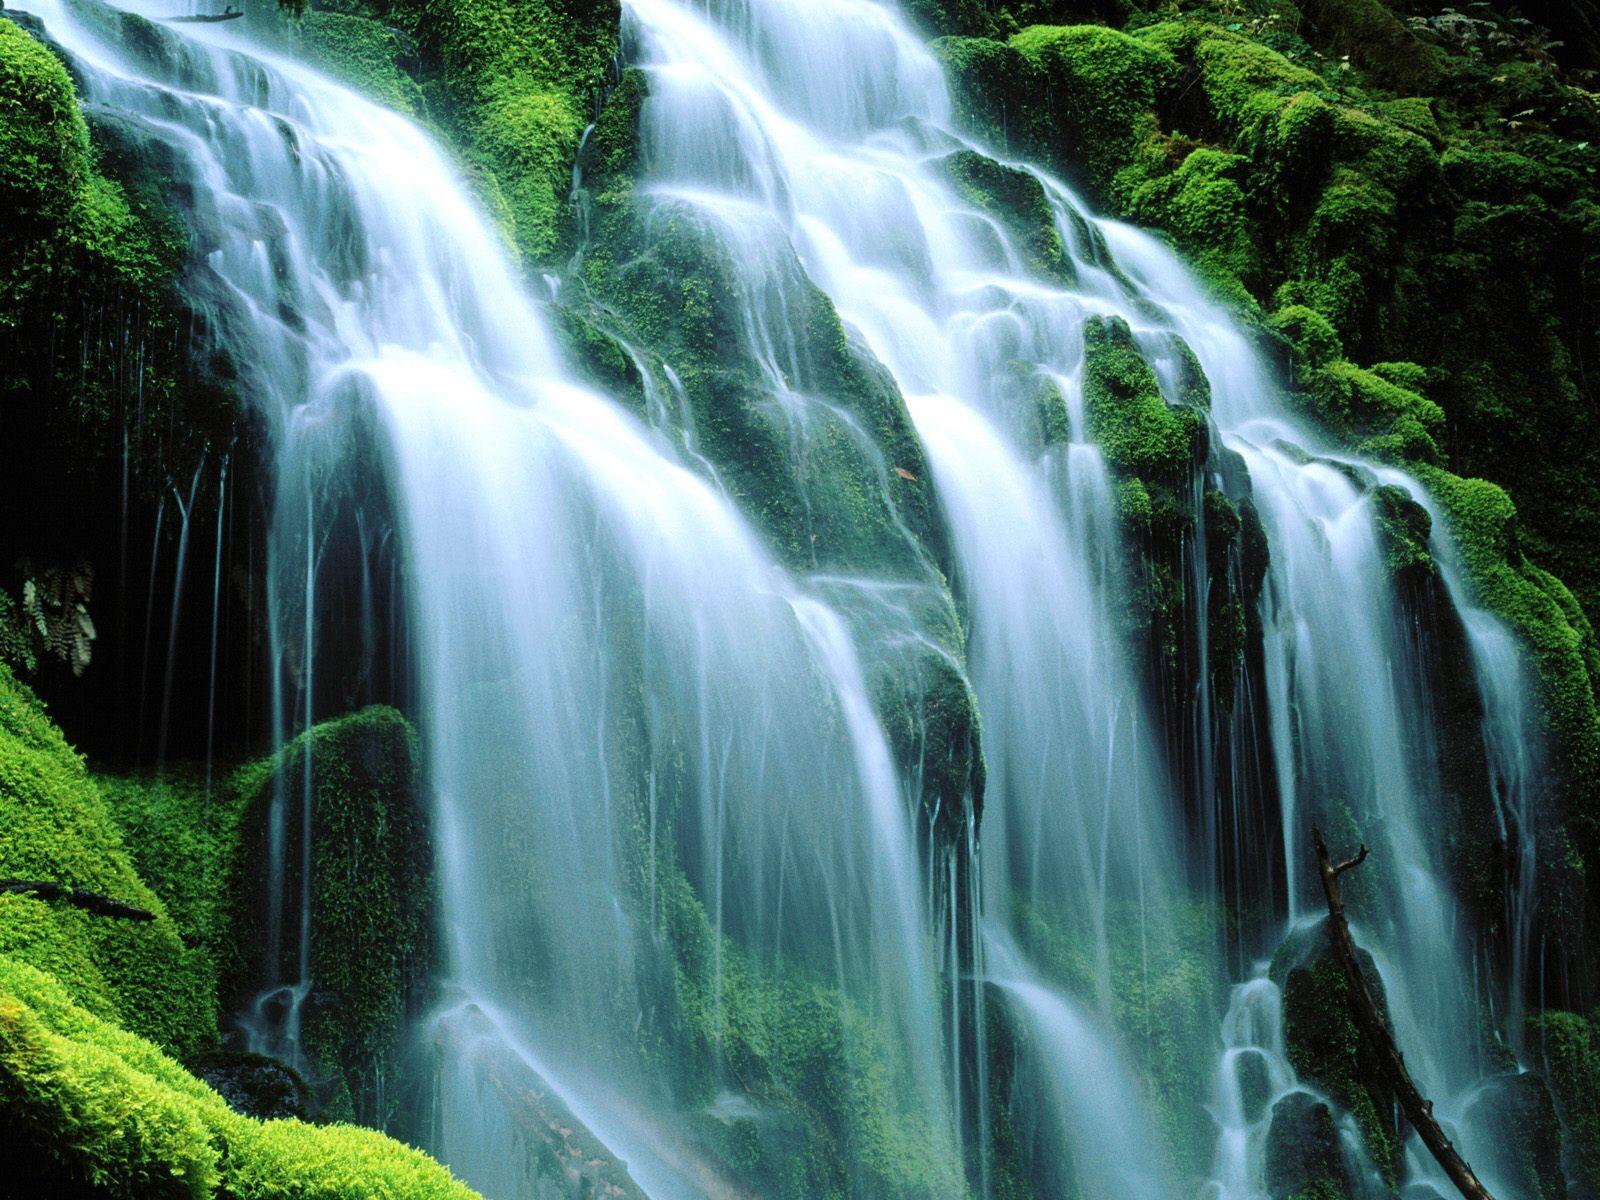 https://2.bp.blogspot.com/-tqVxAxN8KZg/TcmPjaa9baI/AAAAAAAAABs/J58Mmx5ZPnY/s1600/Waterfall-Wallpapers-Pack+%252820%2529.jpg